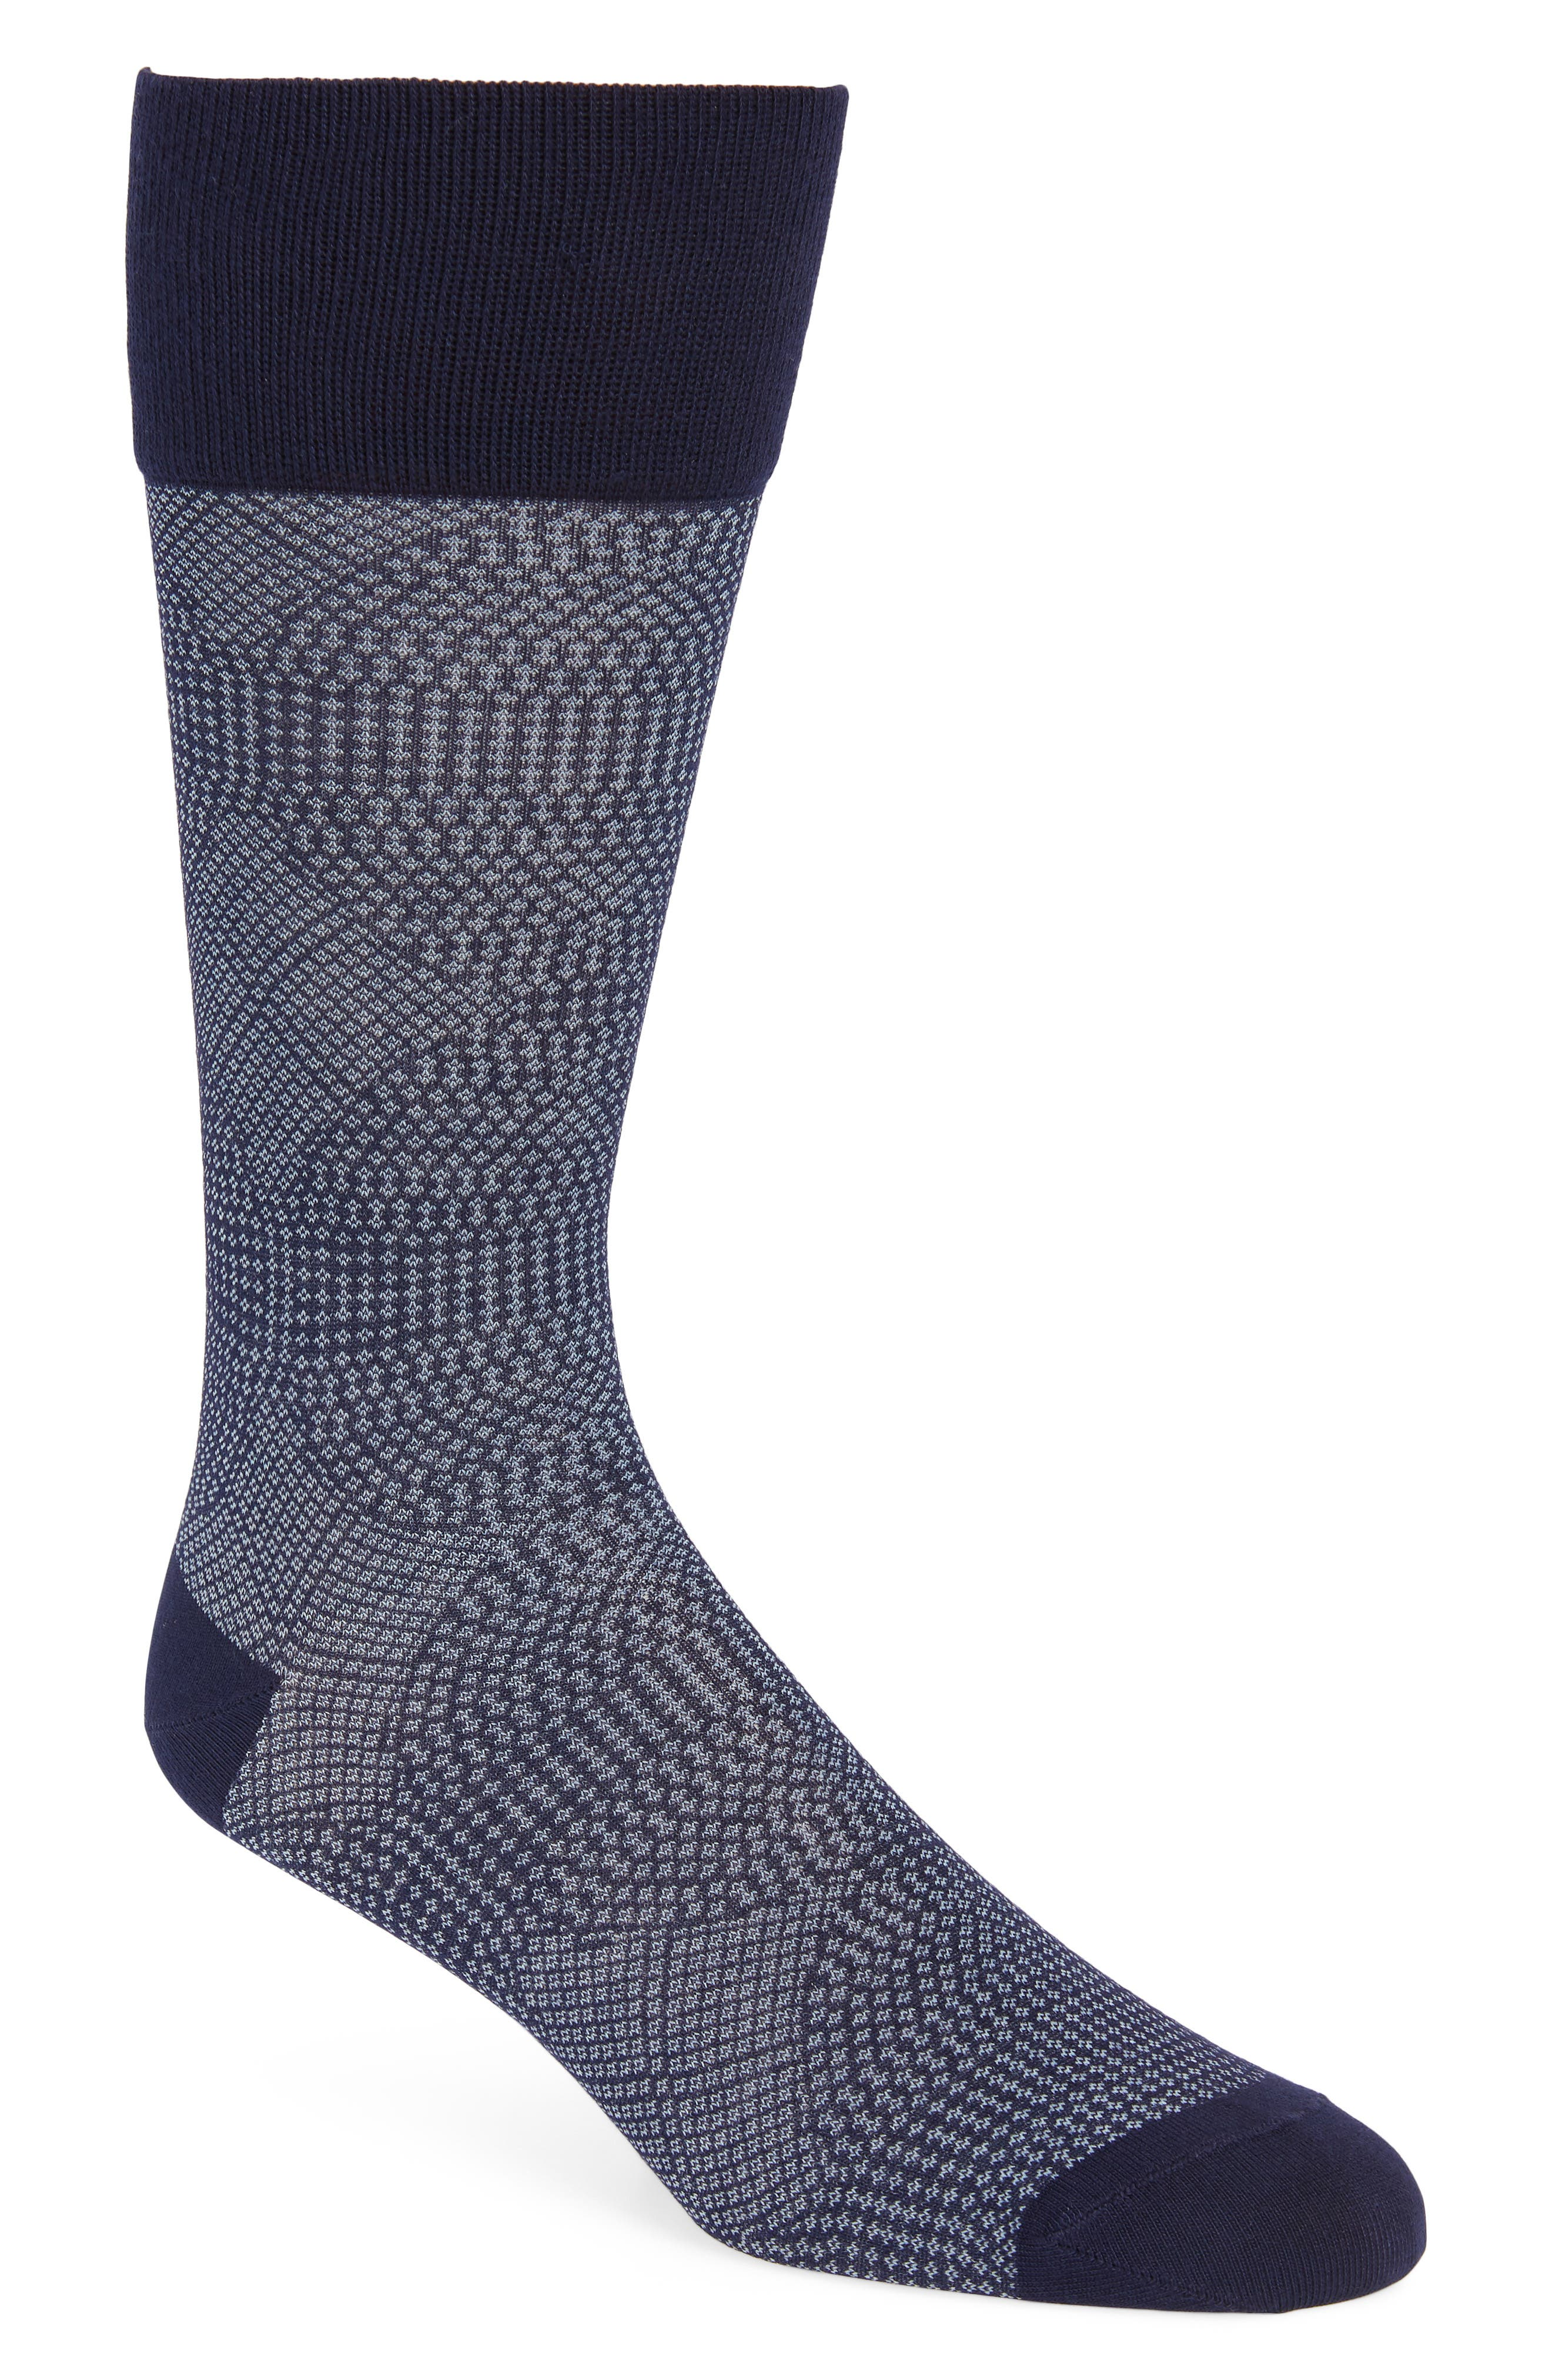 Quatrefoil Solid Socks,                         Main,                         color, 410